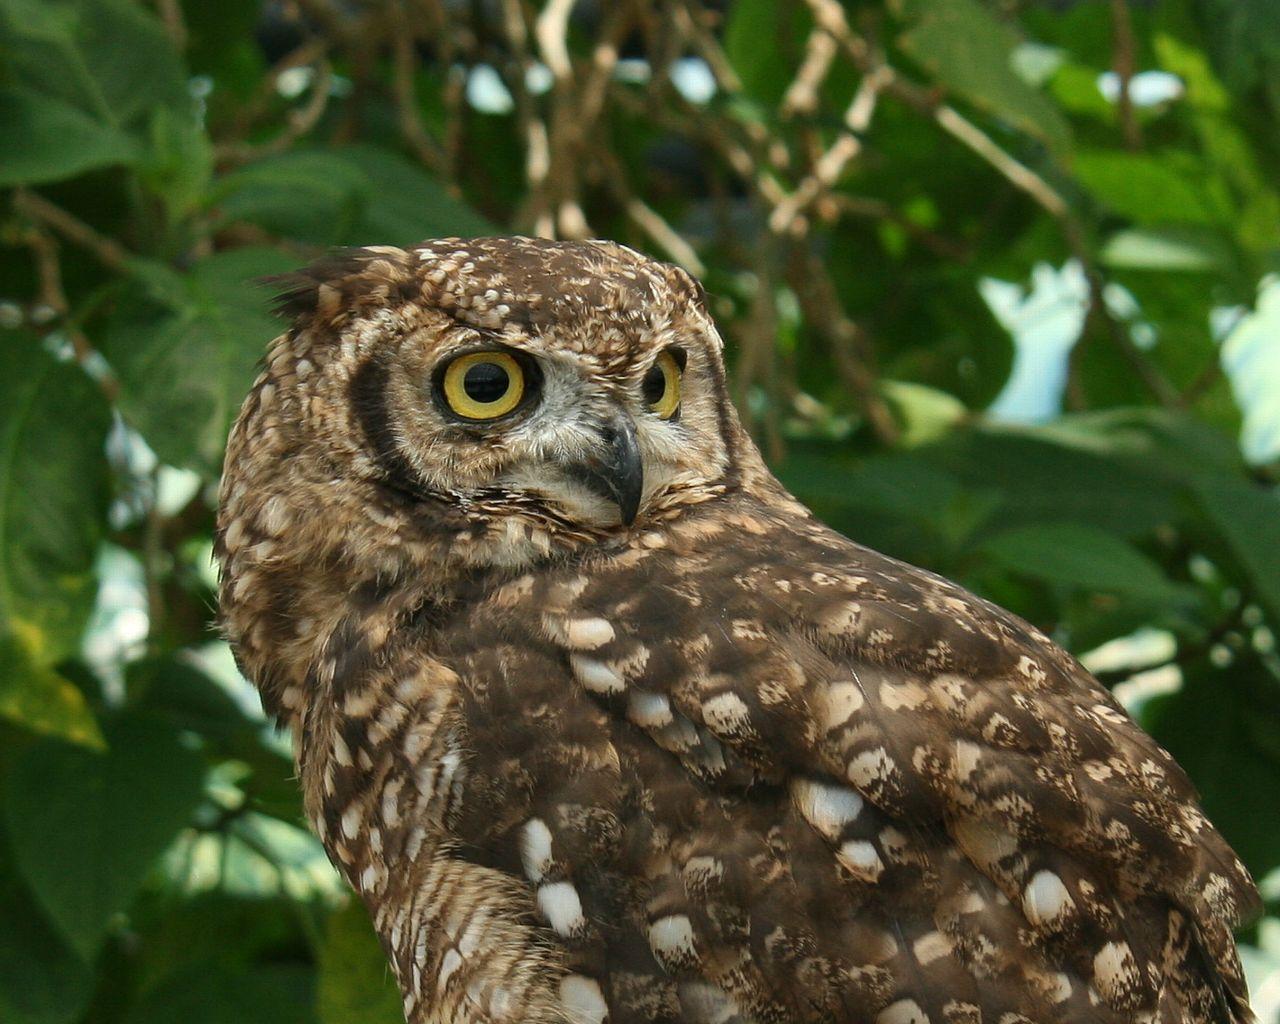 神戸花鳥園の鳥_f0105570_10124256.jpg